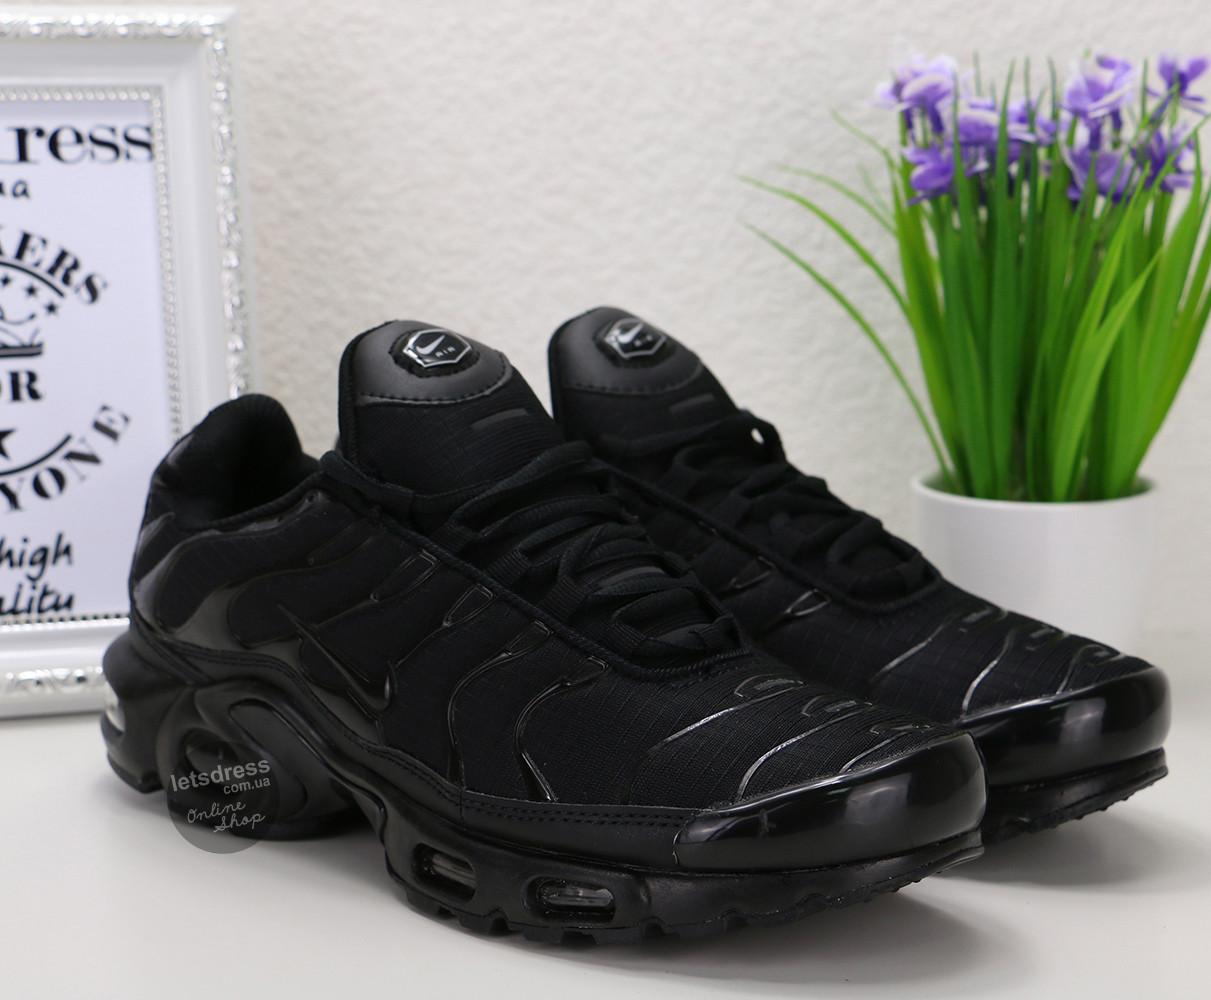 307deb98 Кроссовки мужские Nike Air Max TN Plus black | Найк Аир Макс ТН плюс черные